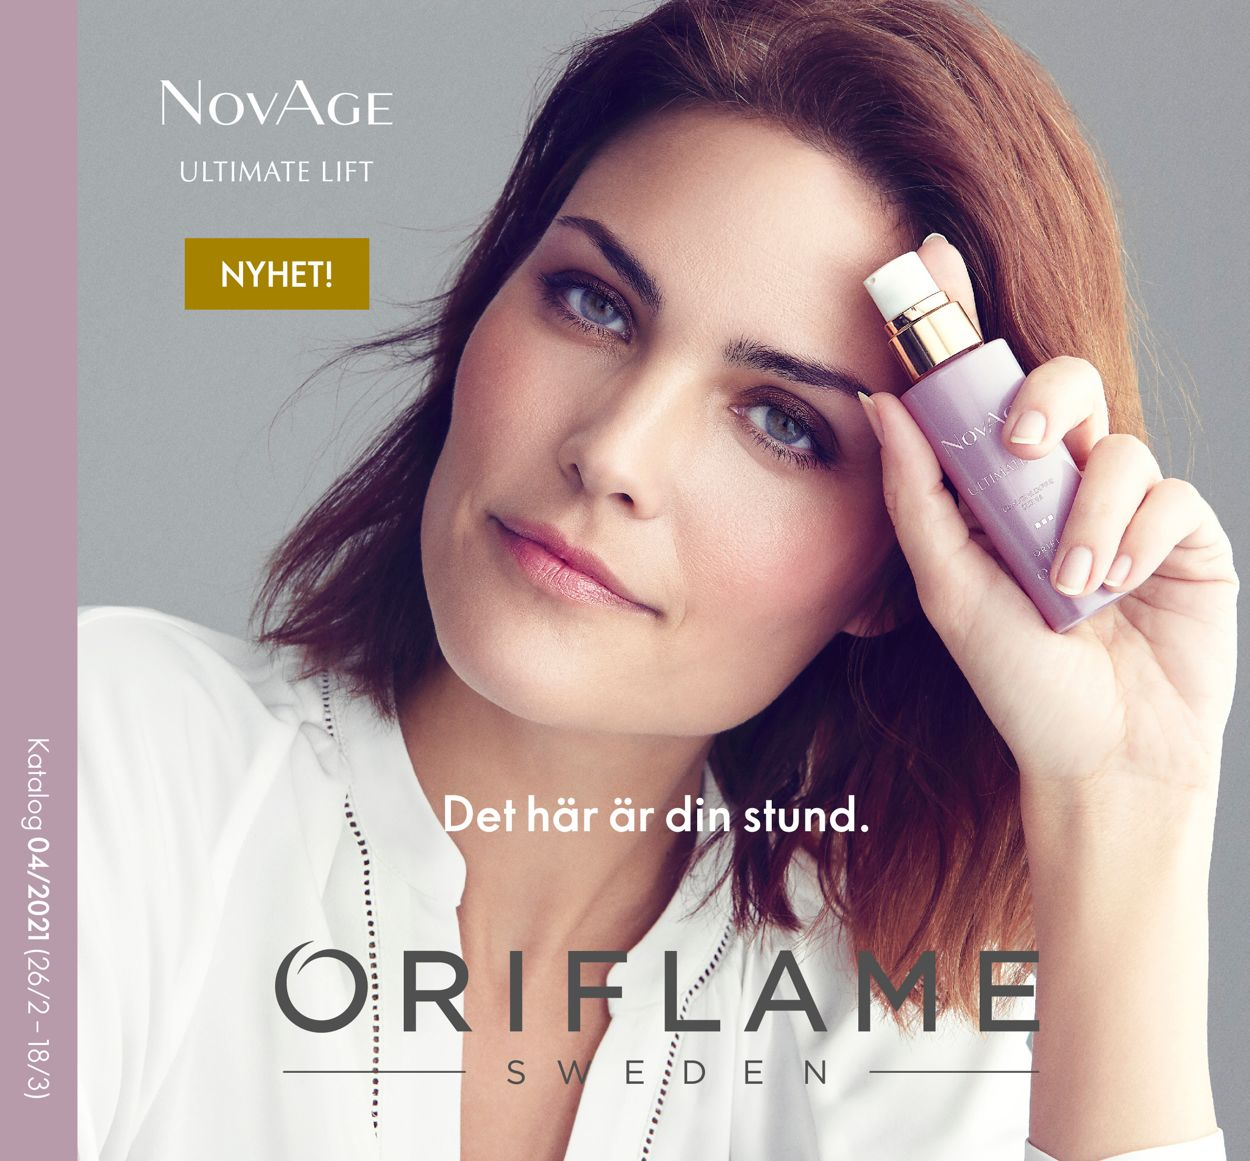 Reklamblad Oriflame från 26/02-2021